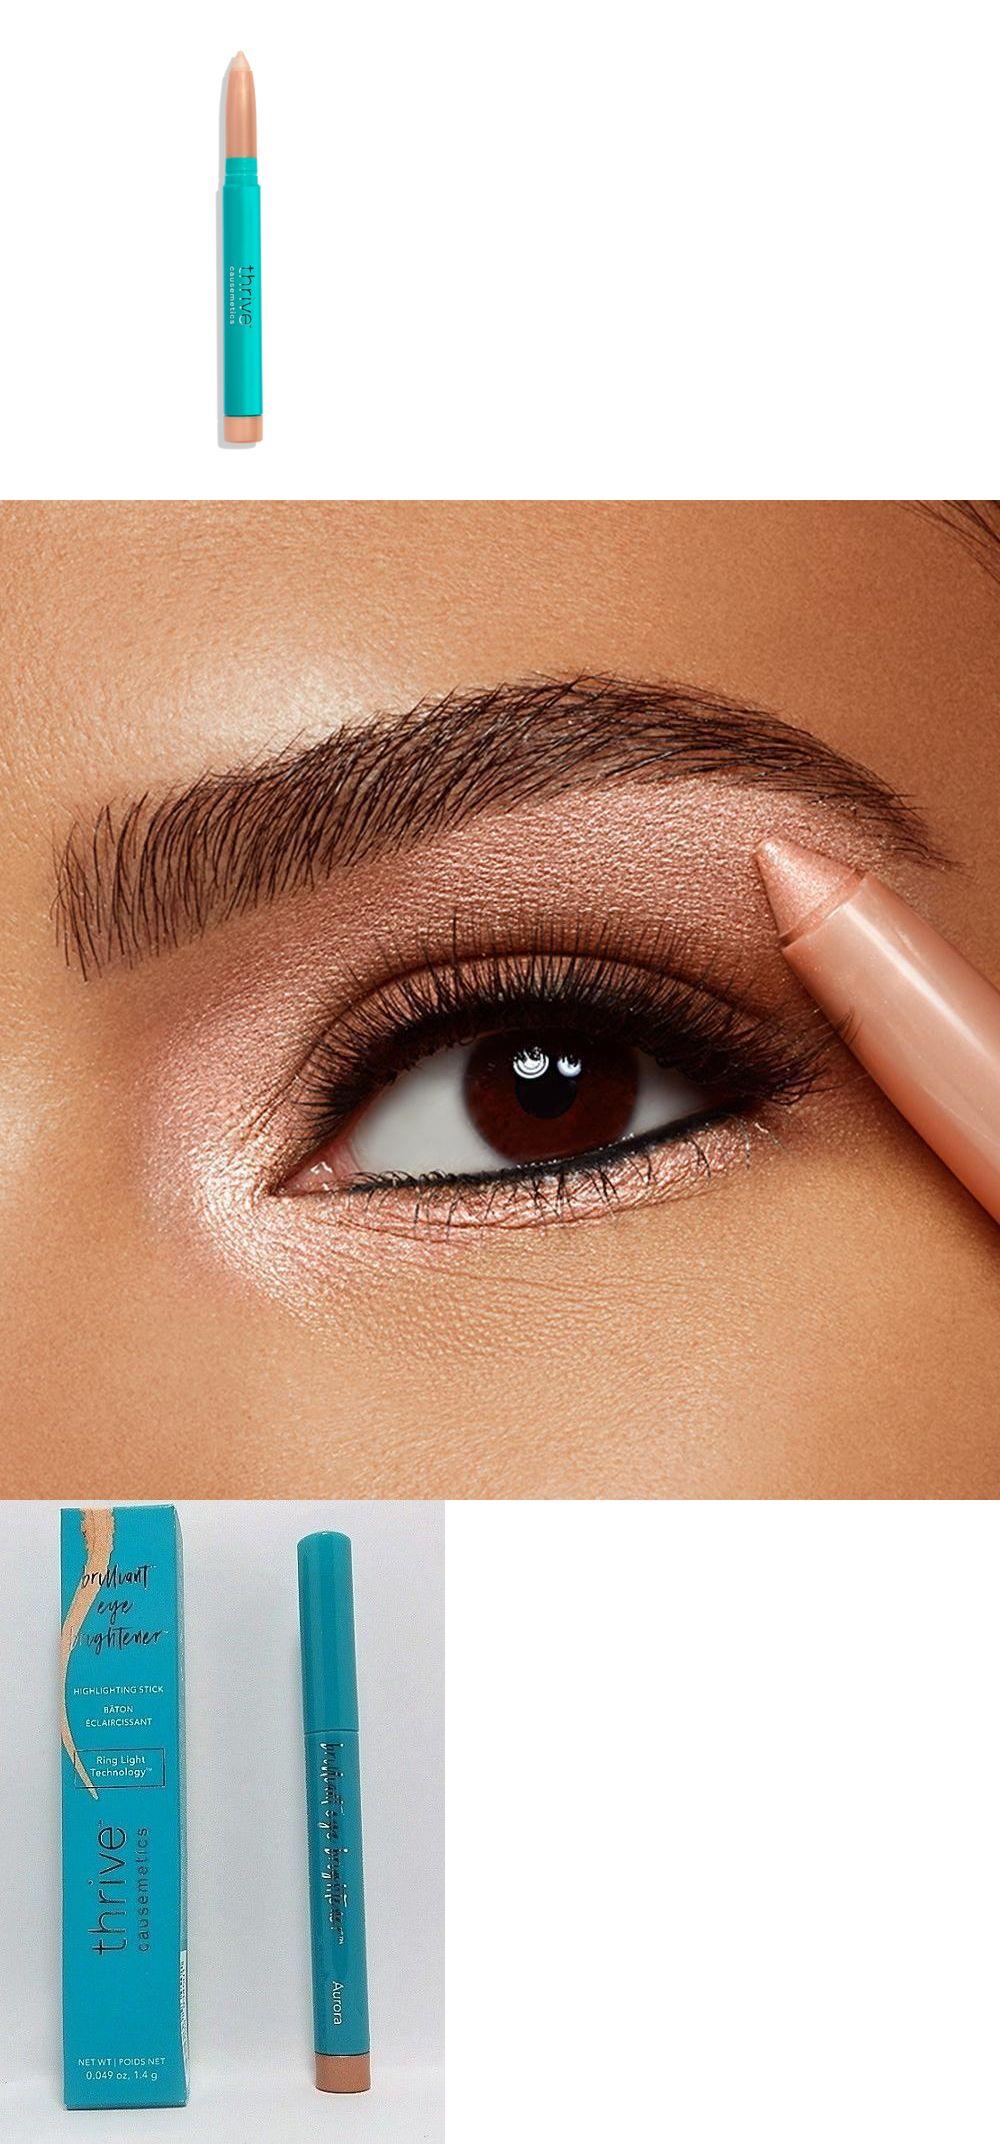 Eye Shadow Liner Combination 172022 Thrive Causemetics